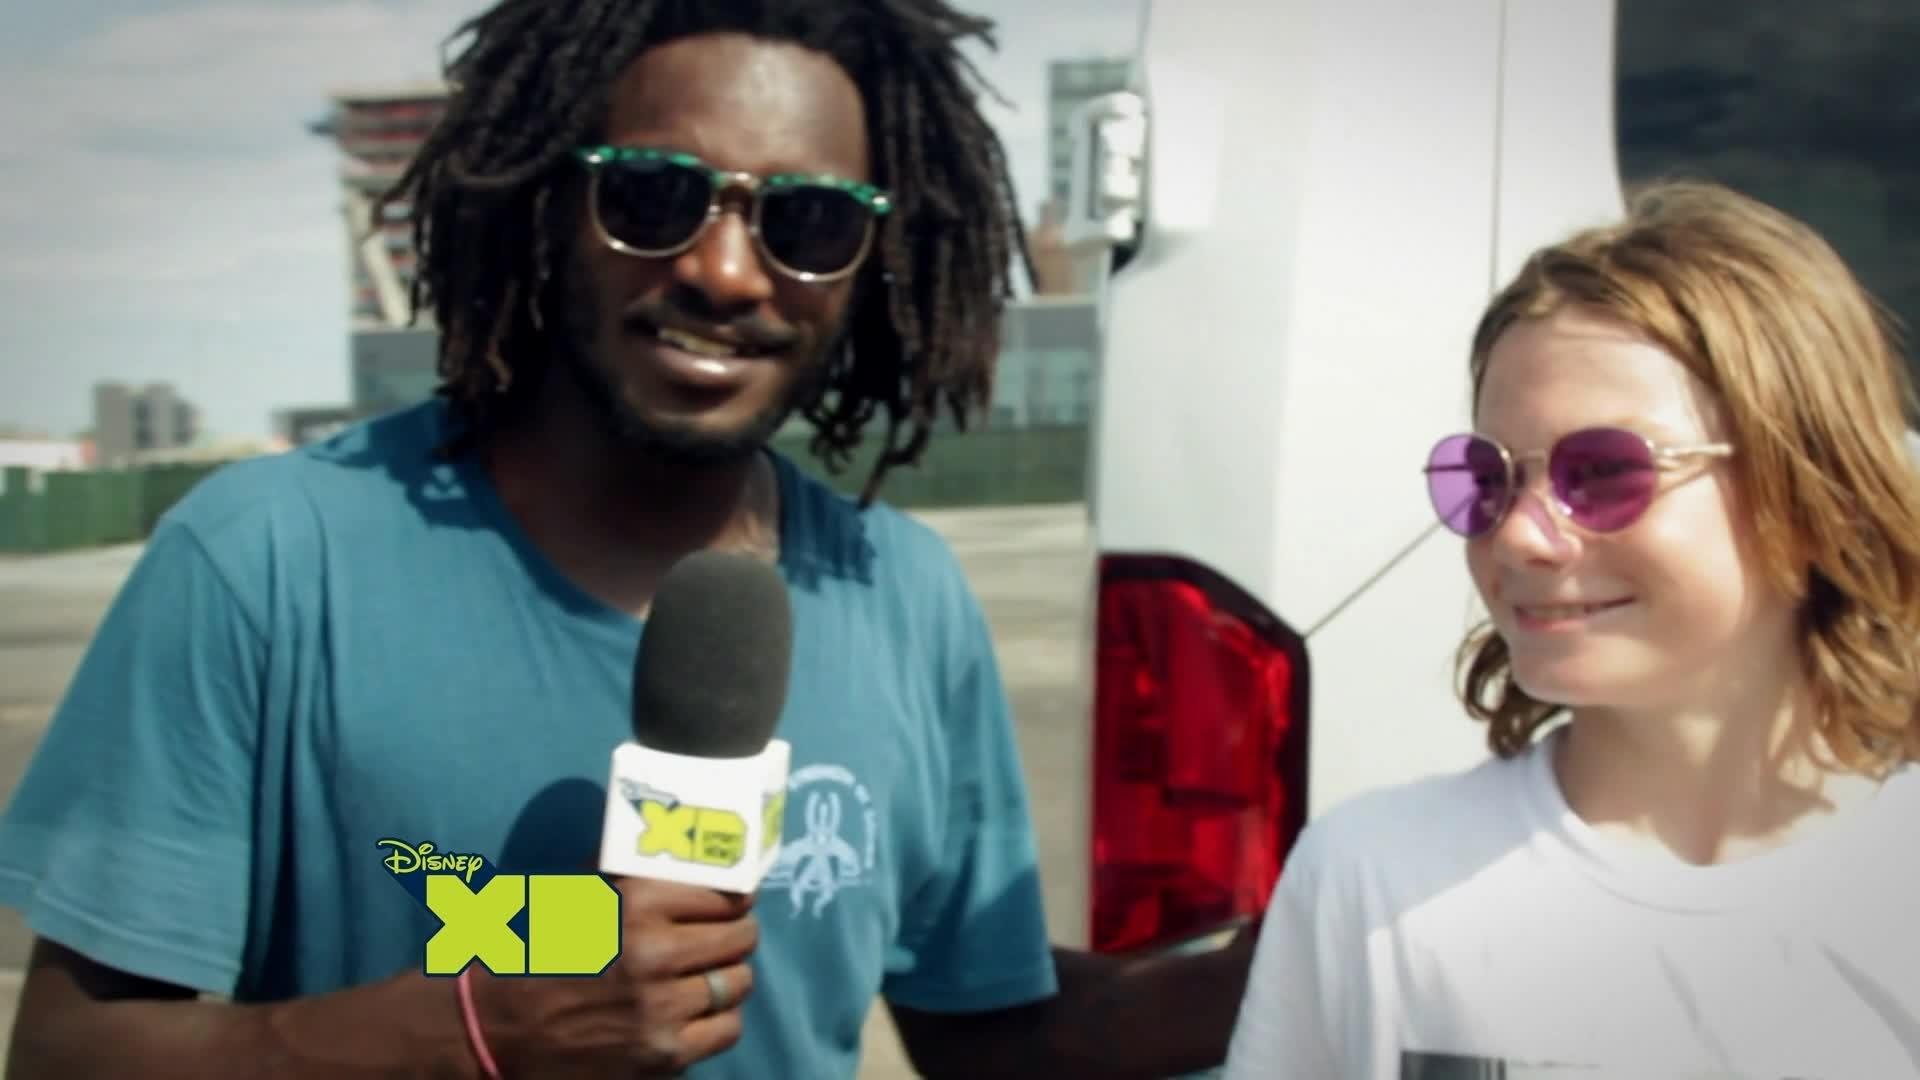 Disney XD Sport News - New-York : Skate